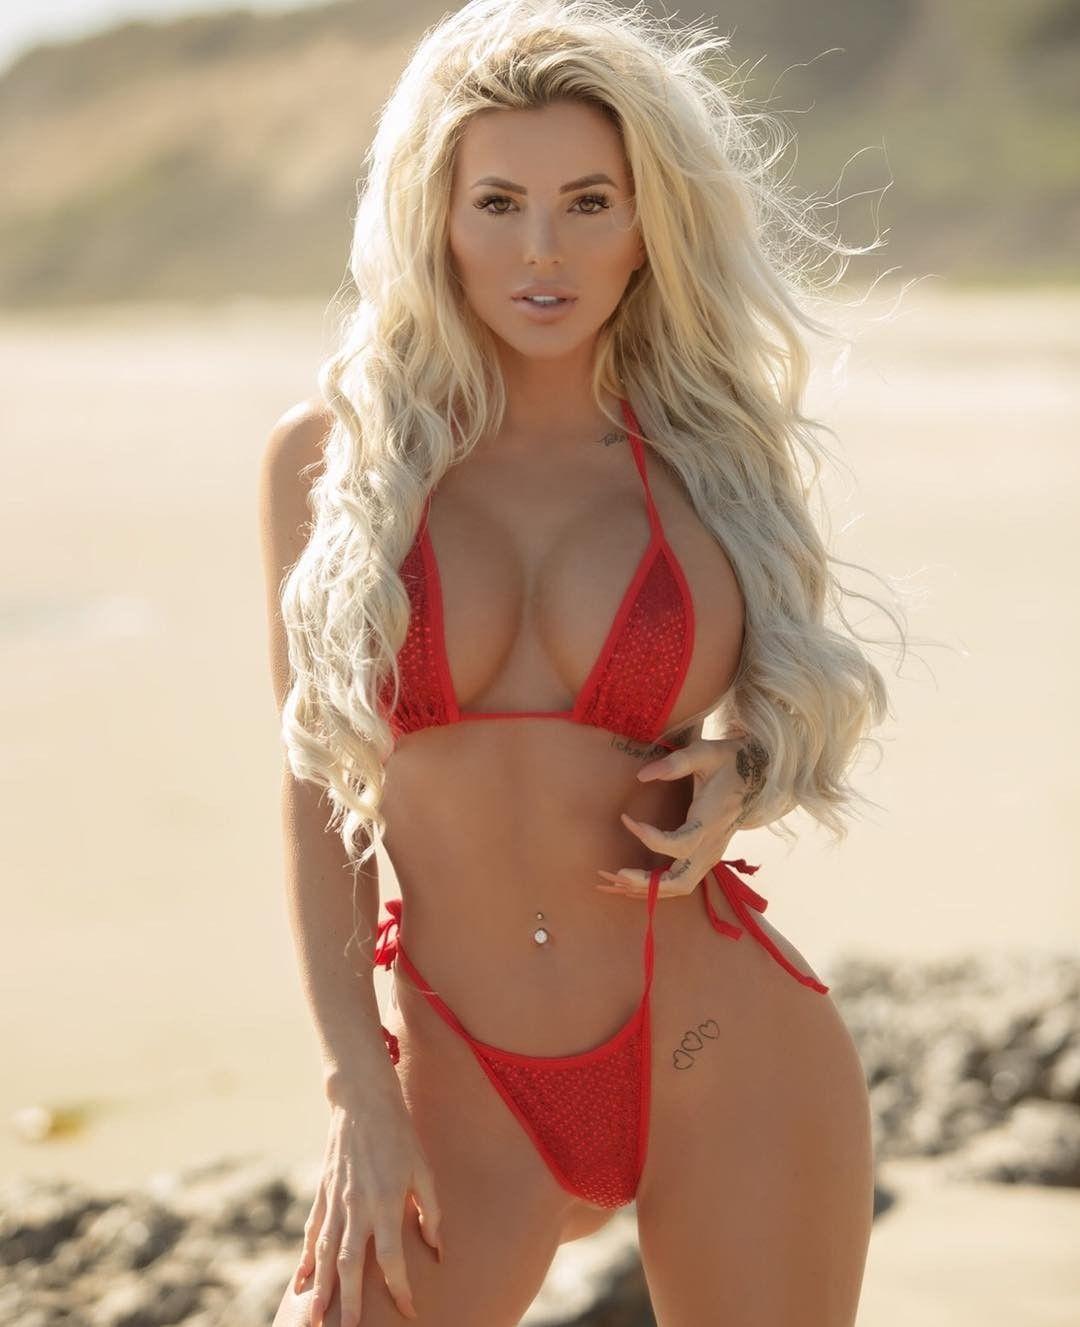 Video Jessica Weaver nude photos 2019